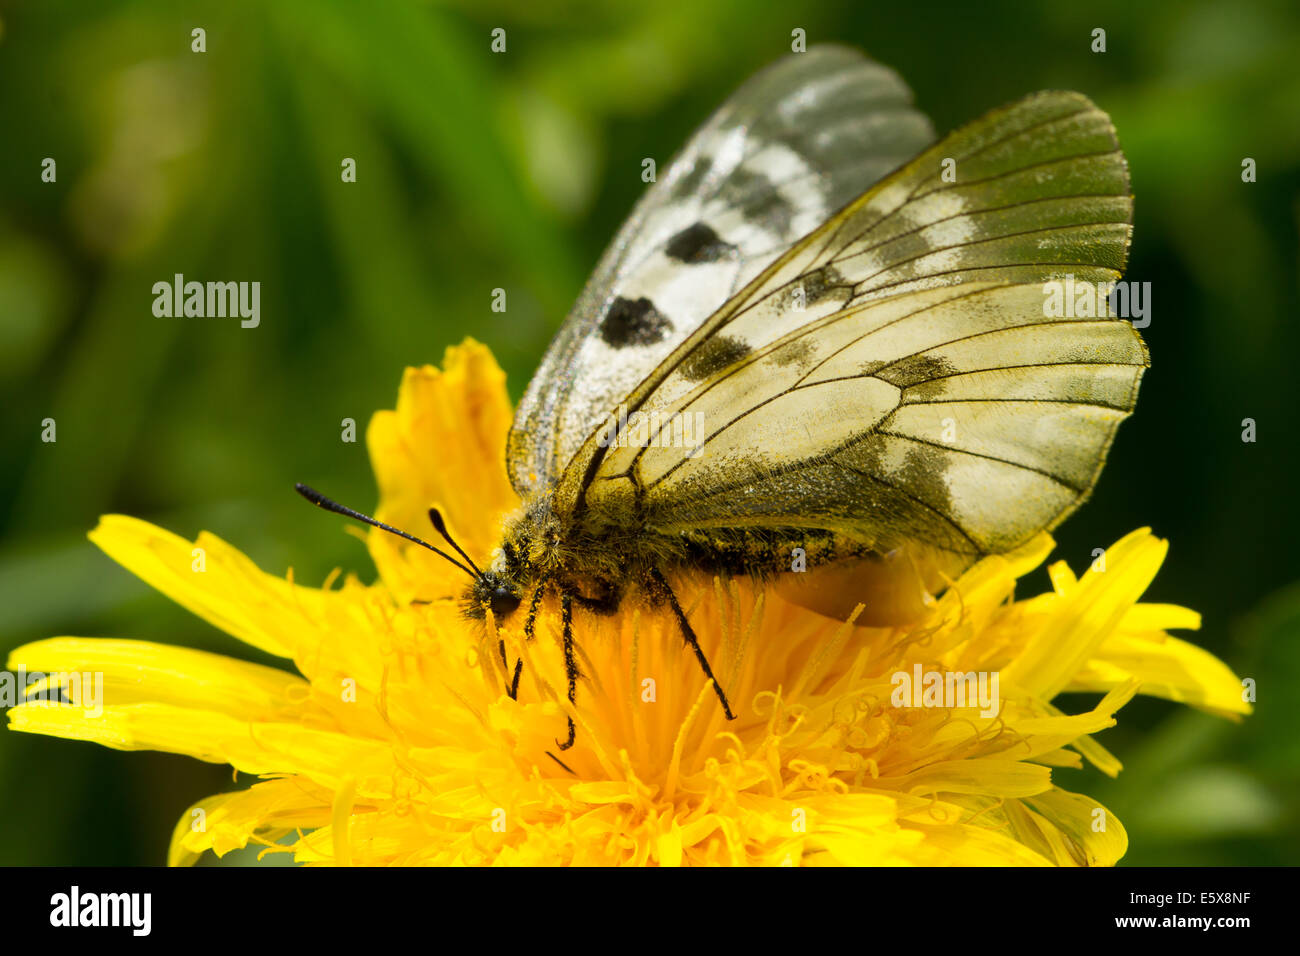 Clouded Apollo (Parnassius mnemosyne) feeding on a dandelion - Stock Image